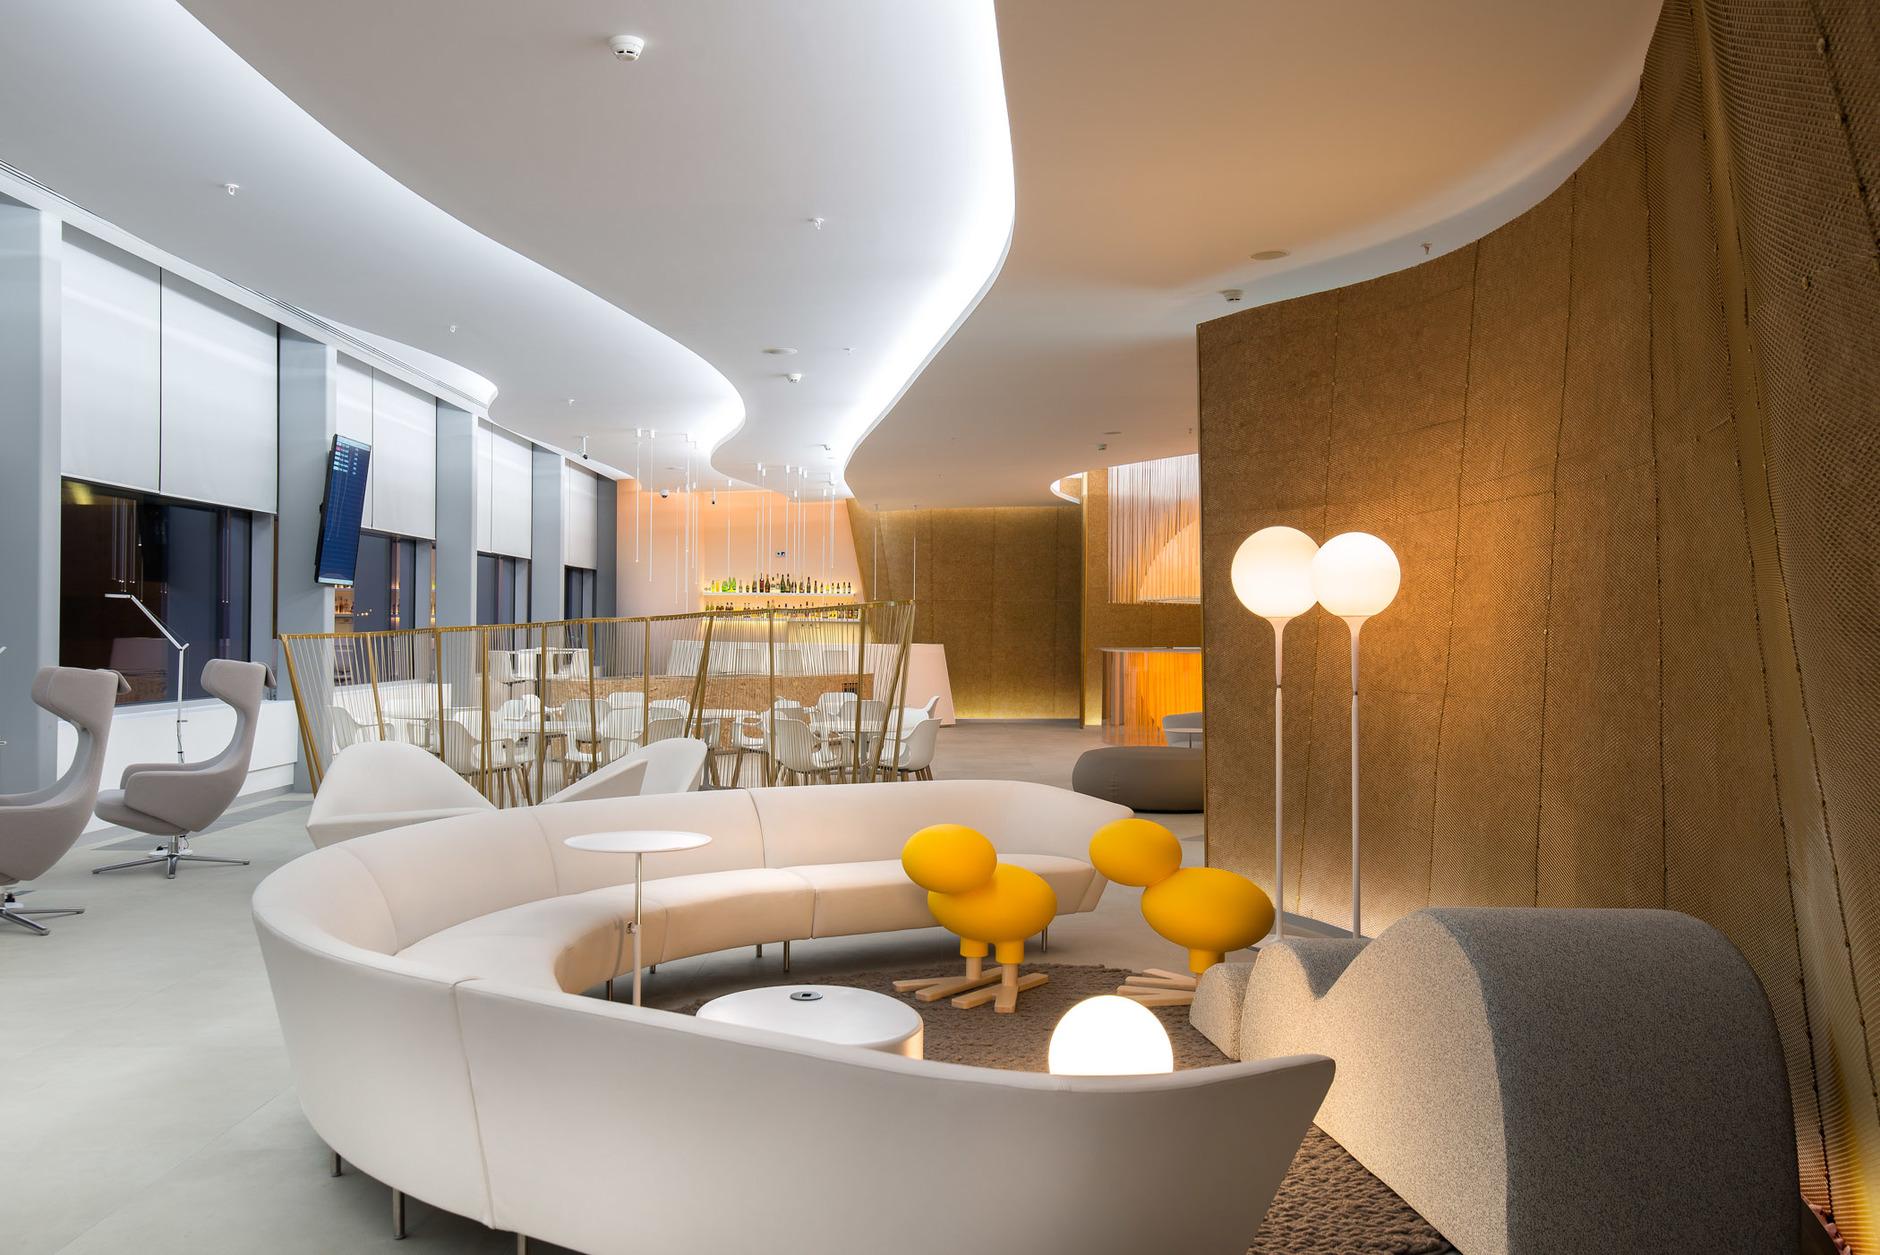 Бизнес-лаунж аэропорта «Платов» в Ростове-на-Дону: проект VOX Architects (галерея 9, фото 0)